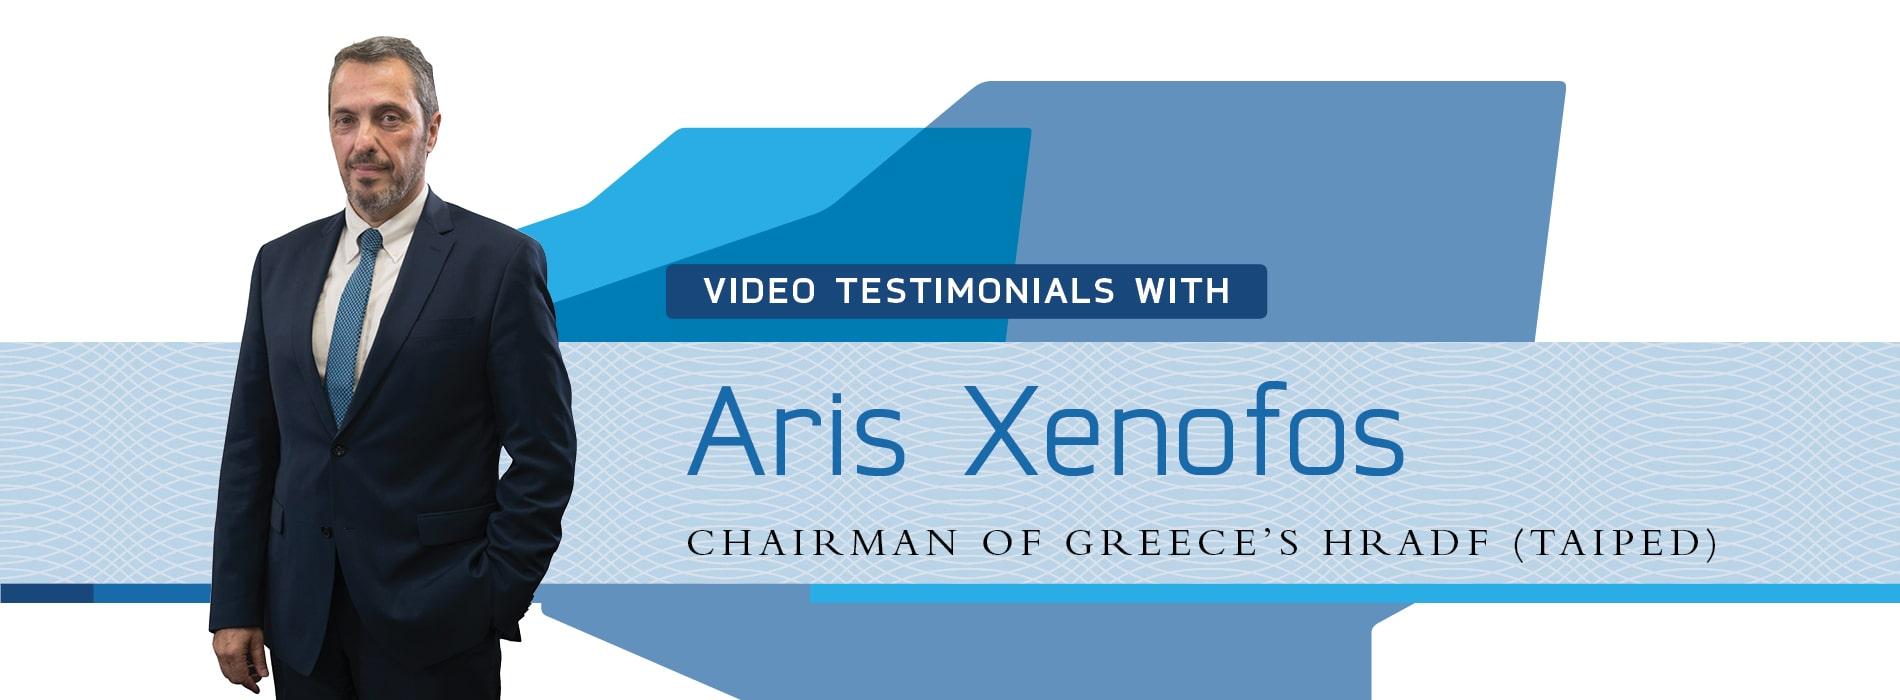 Testimonial Videos: Aris Xenofos, Executive Chairman of the Hellenic Republic Asset Development Fund